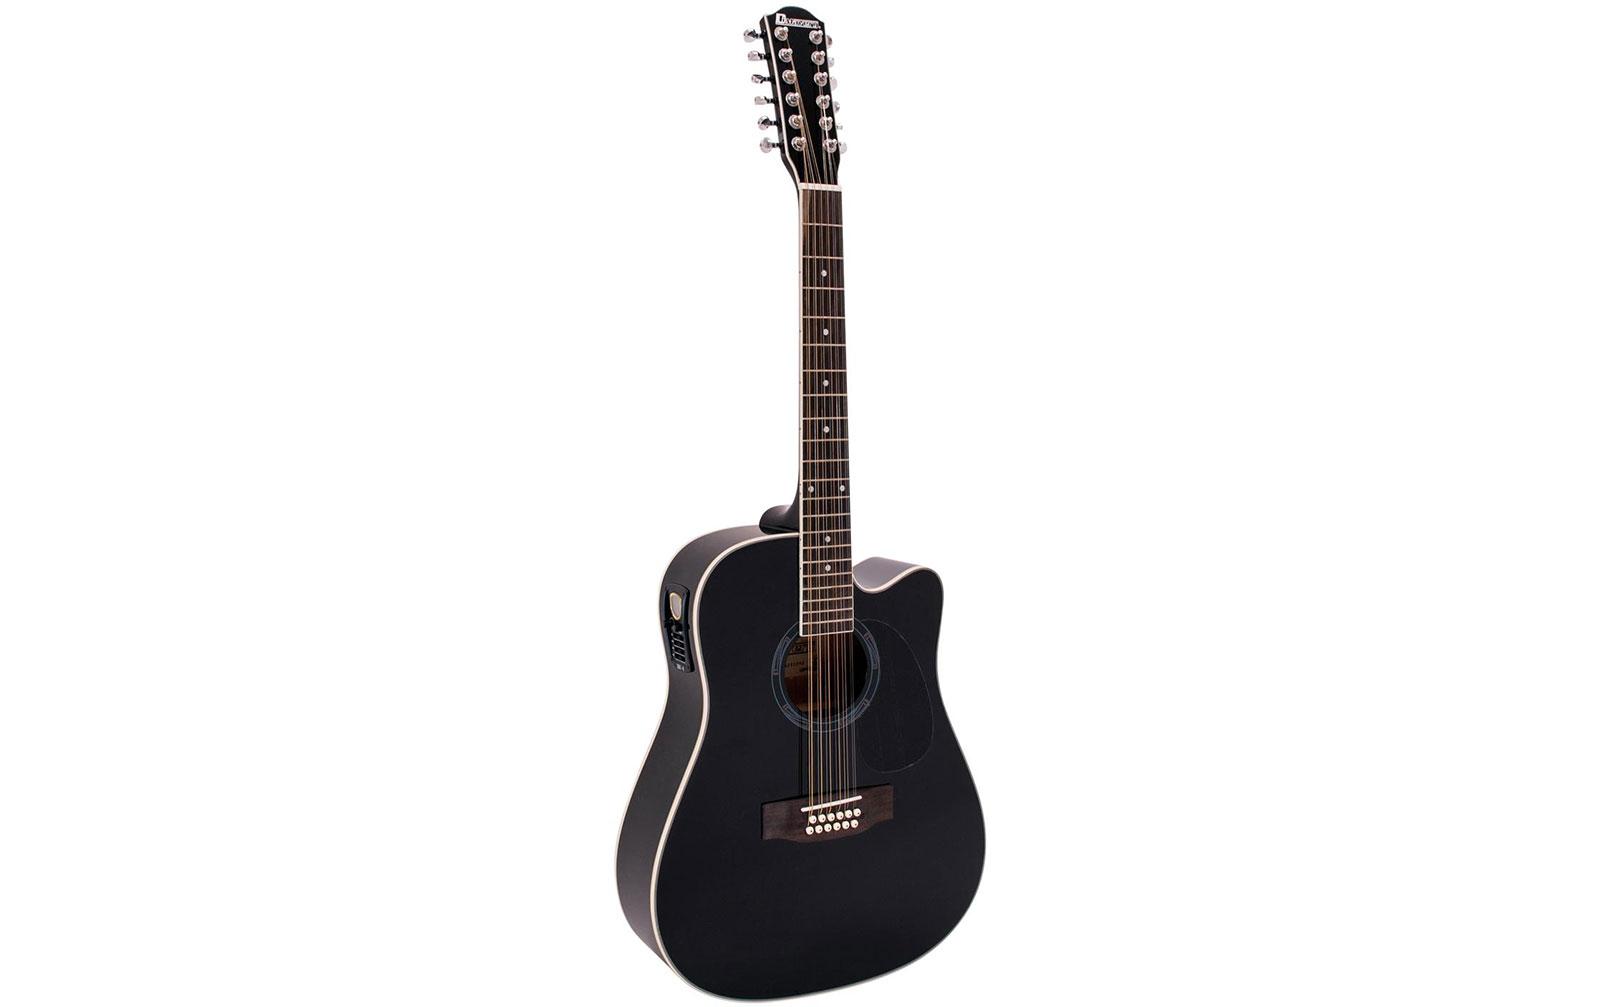 dimavery-dr-612-western-gitarre-12-saitig-schwarz